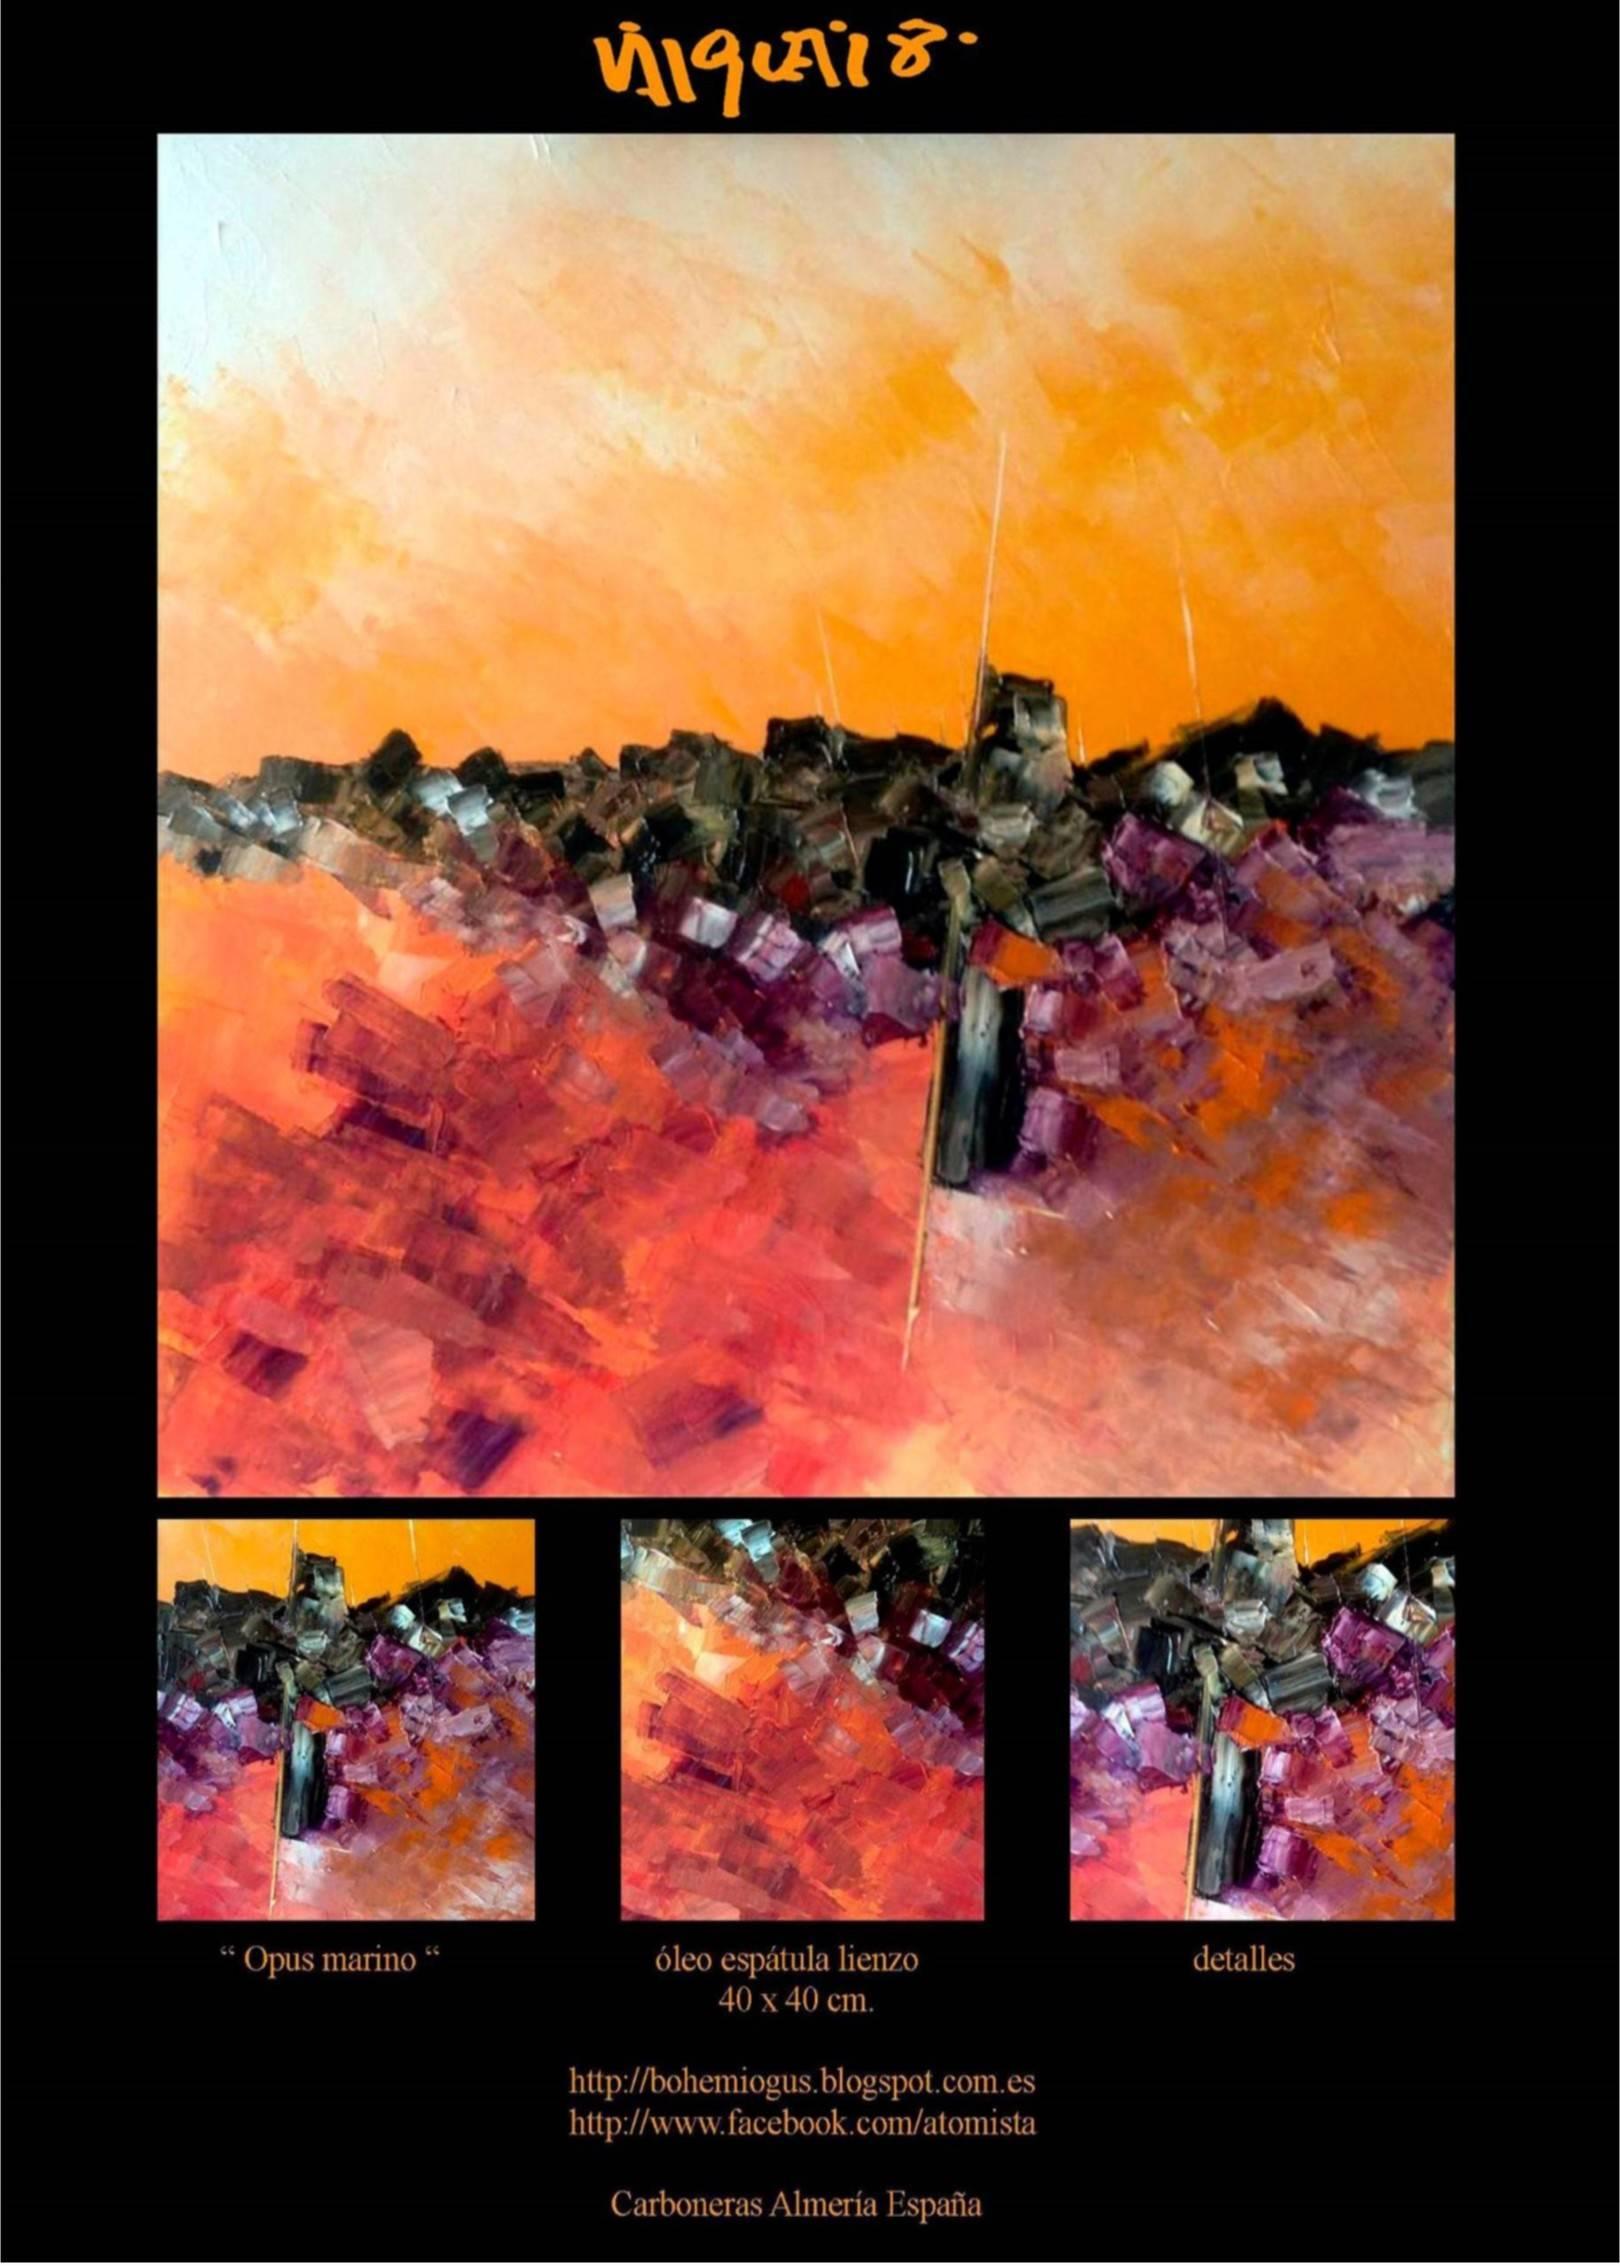 Opus marino. 2018 óleo espátula lienzo 40 x 40 cm. http://bohemiogus.blogspot.com